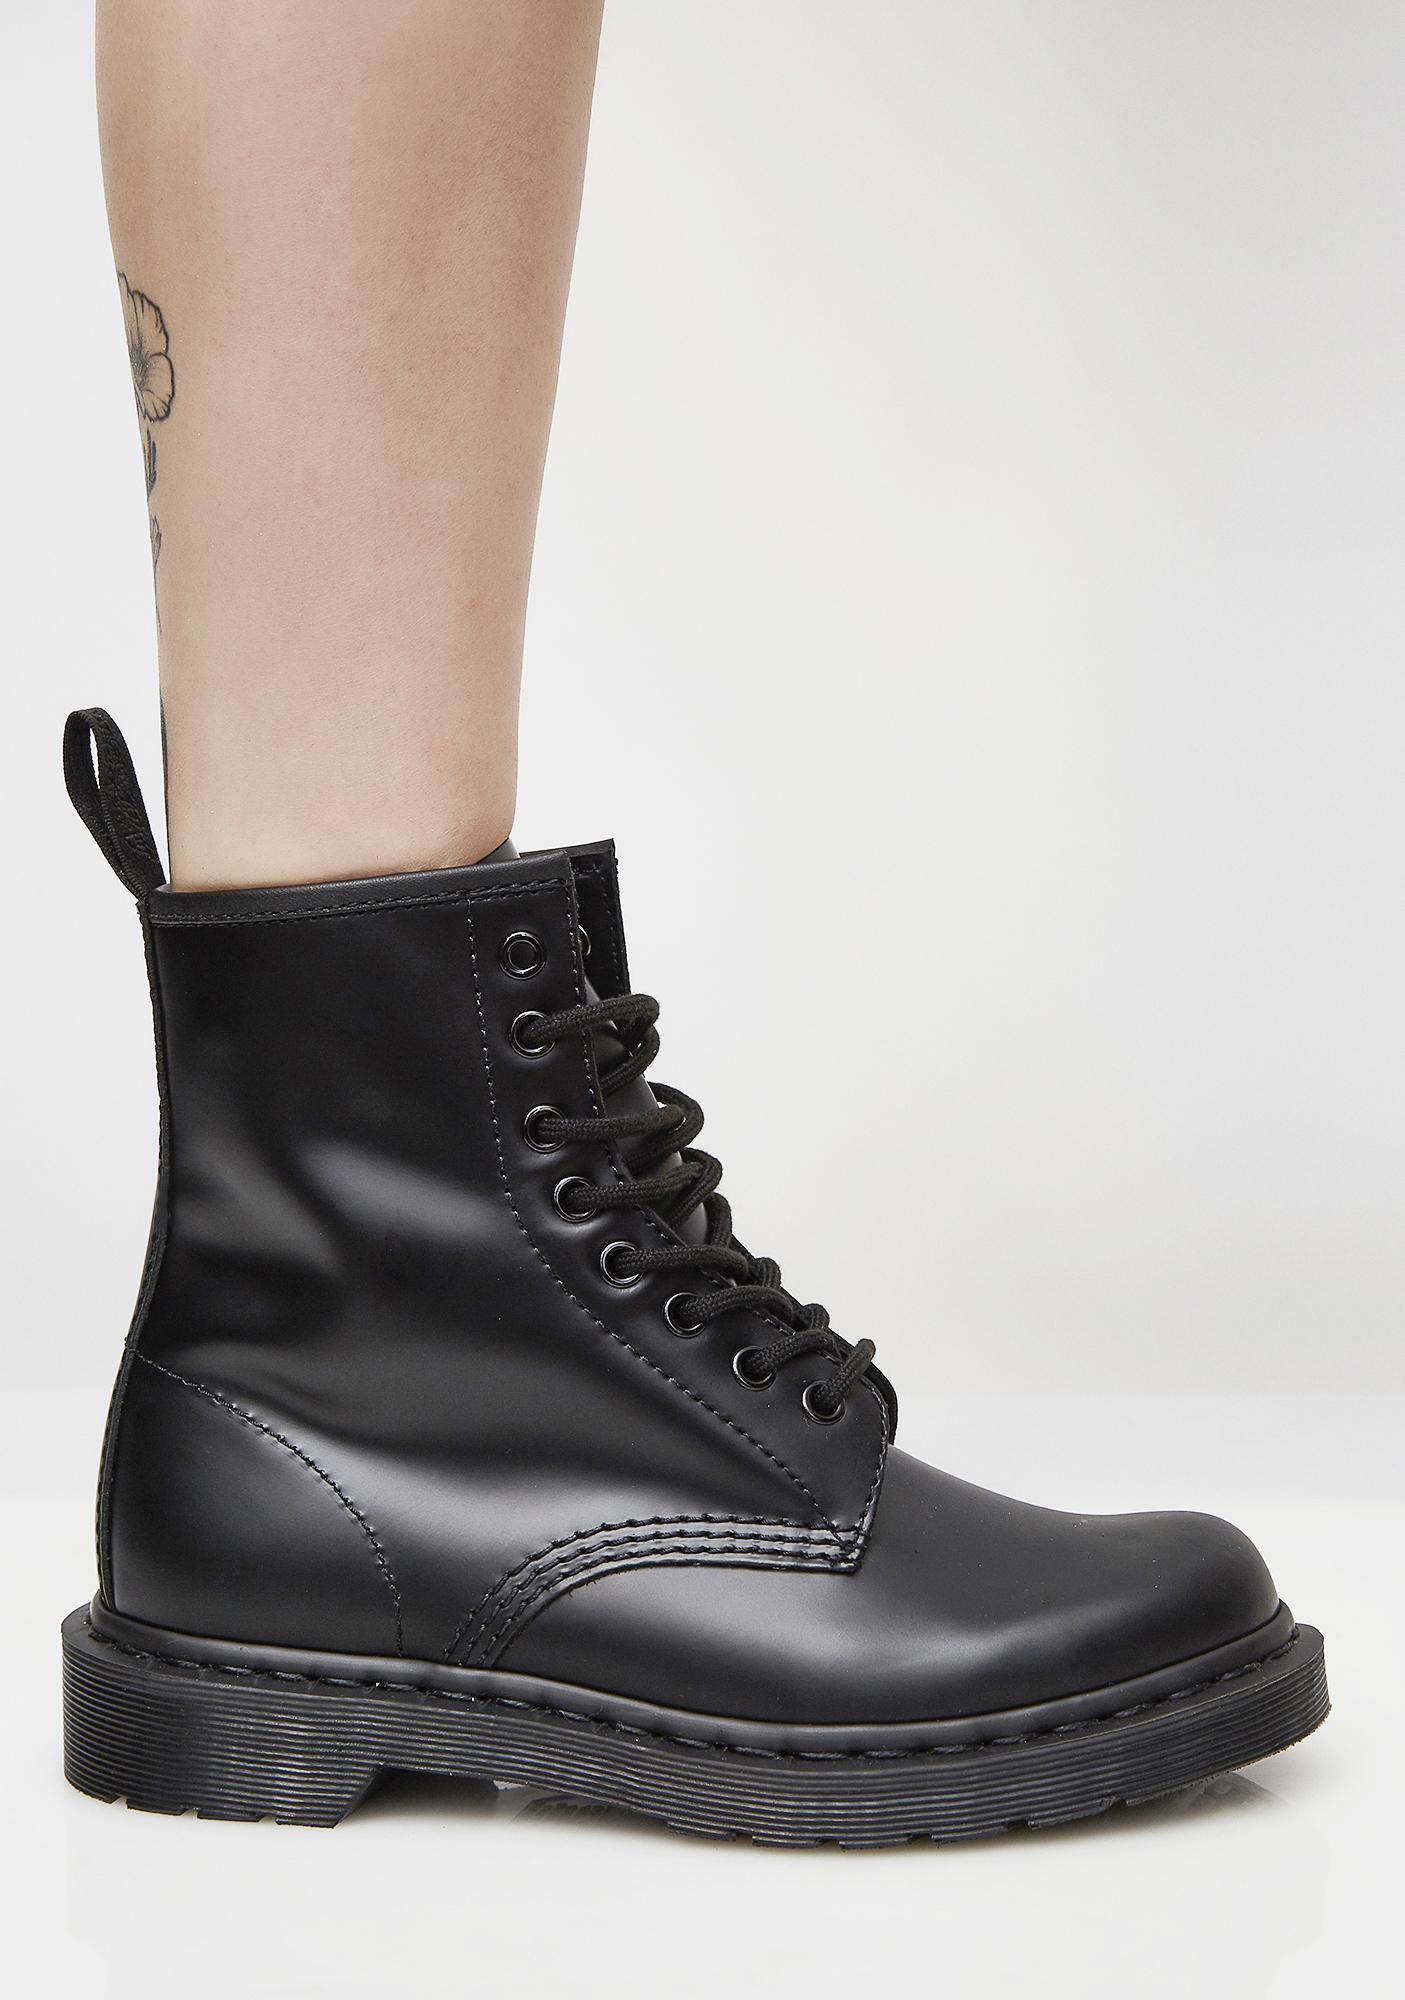 beaebbec233afa ... Dr. Martens Black 1460 Mono Boots ...